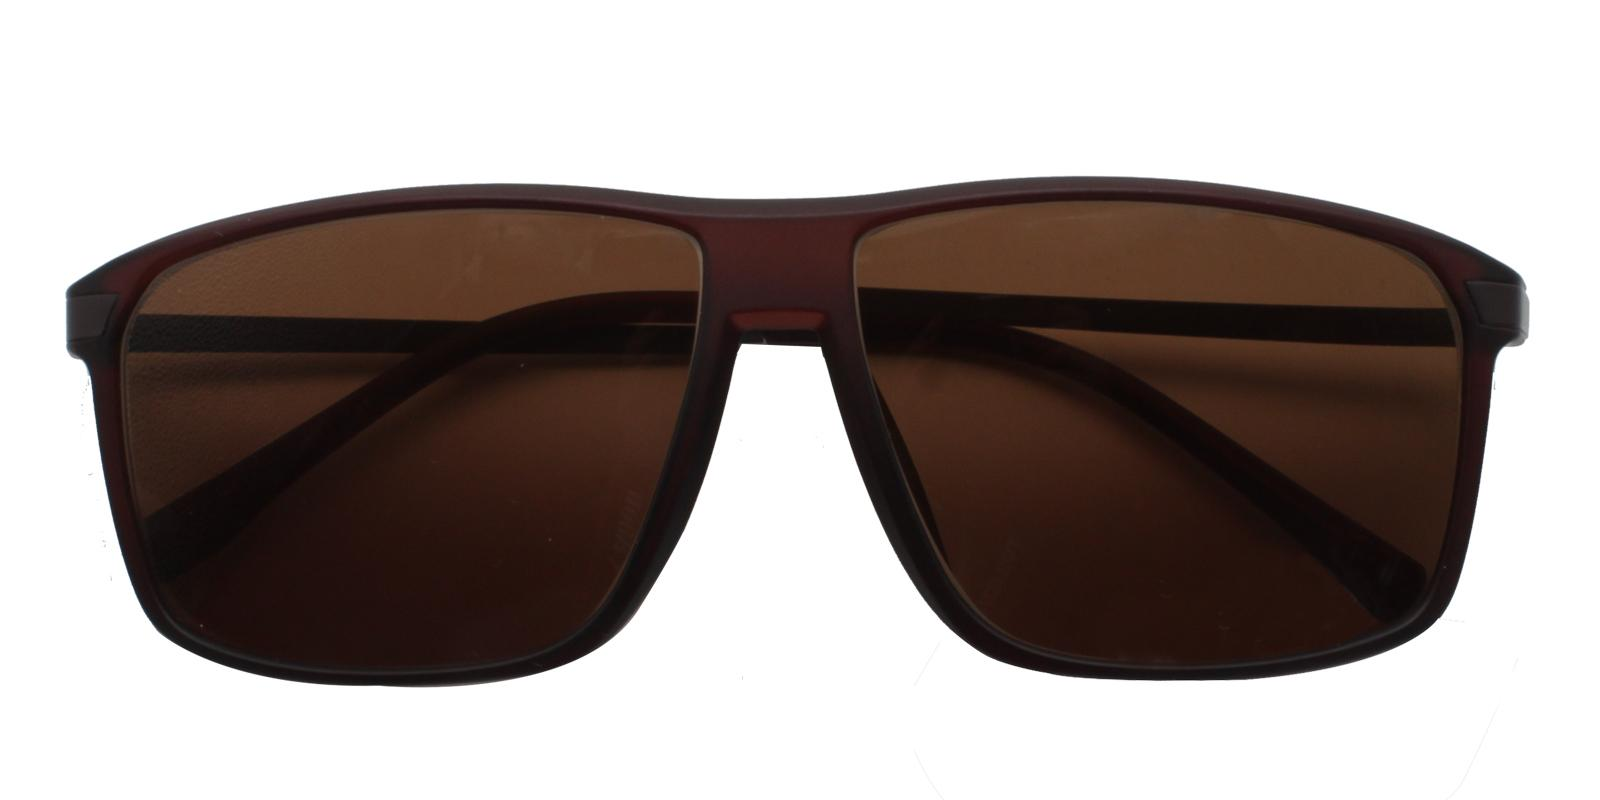 Burundi Brown TR Sunglasses , UniversalBridgeFit Frames from ABBE Glasses